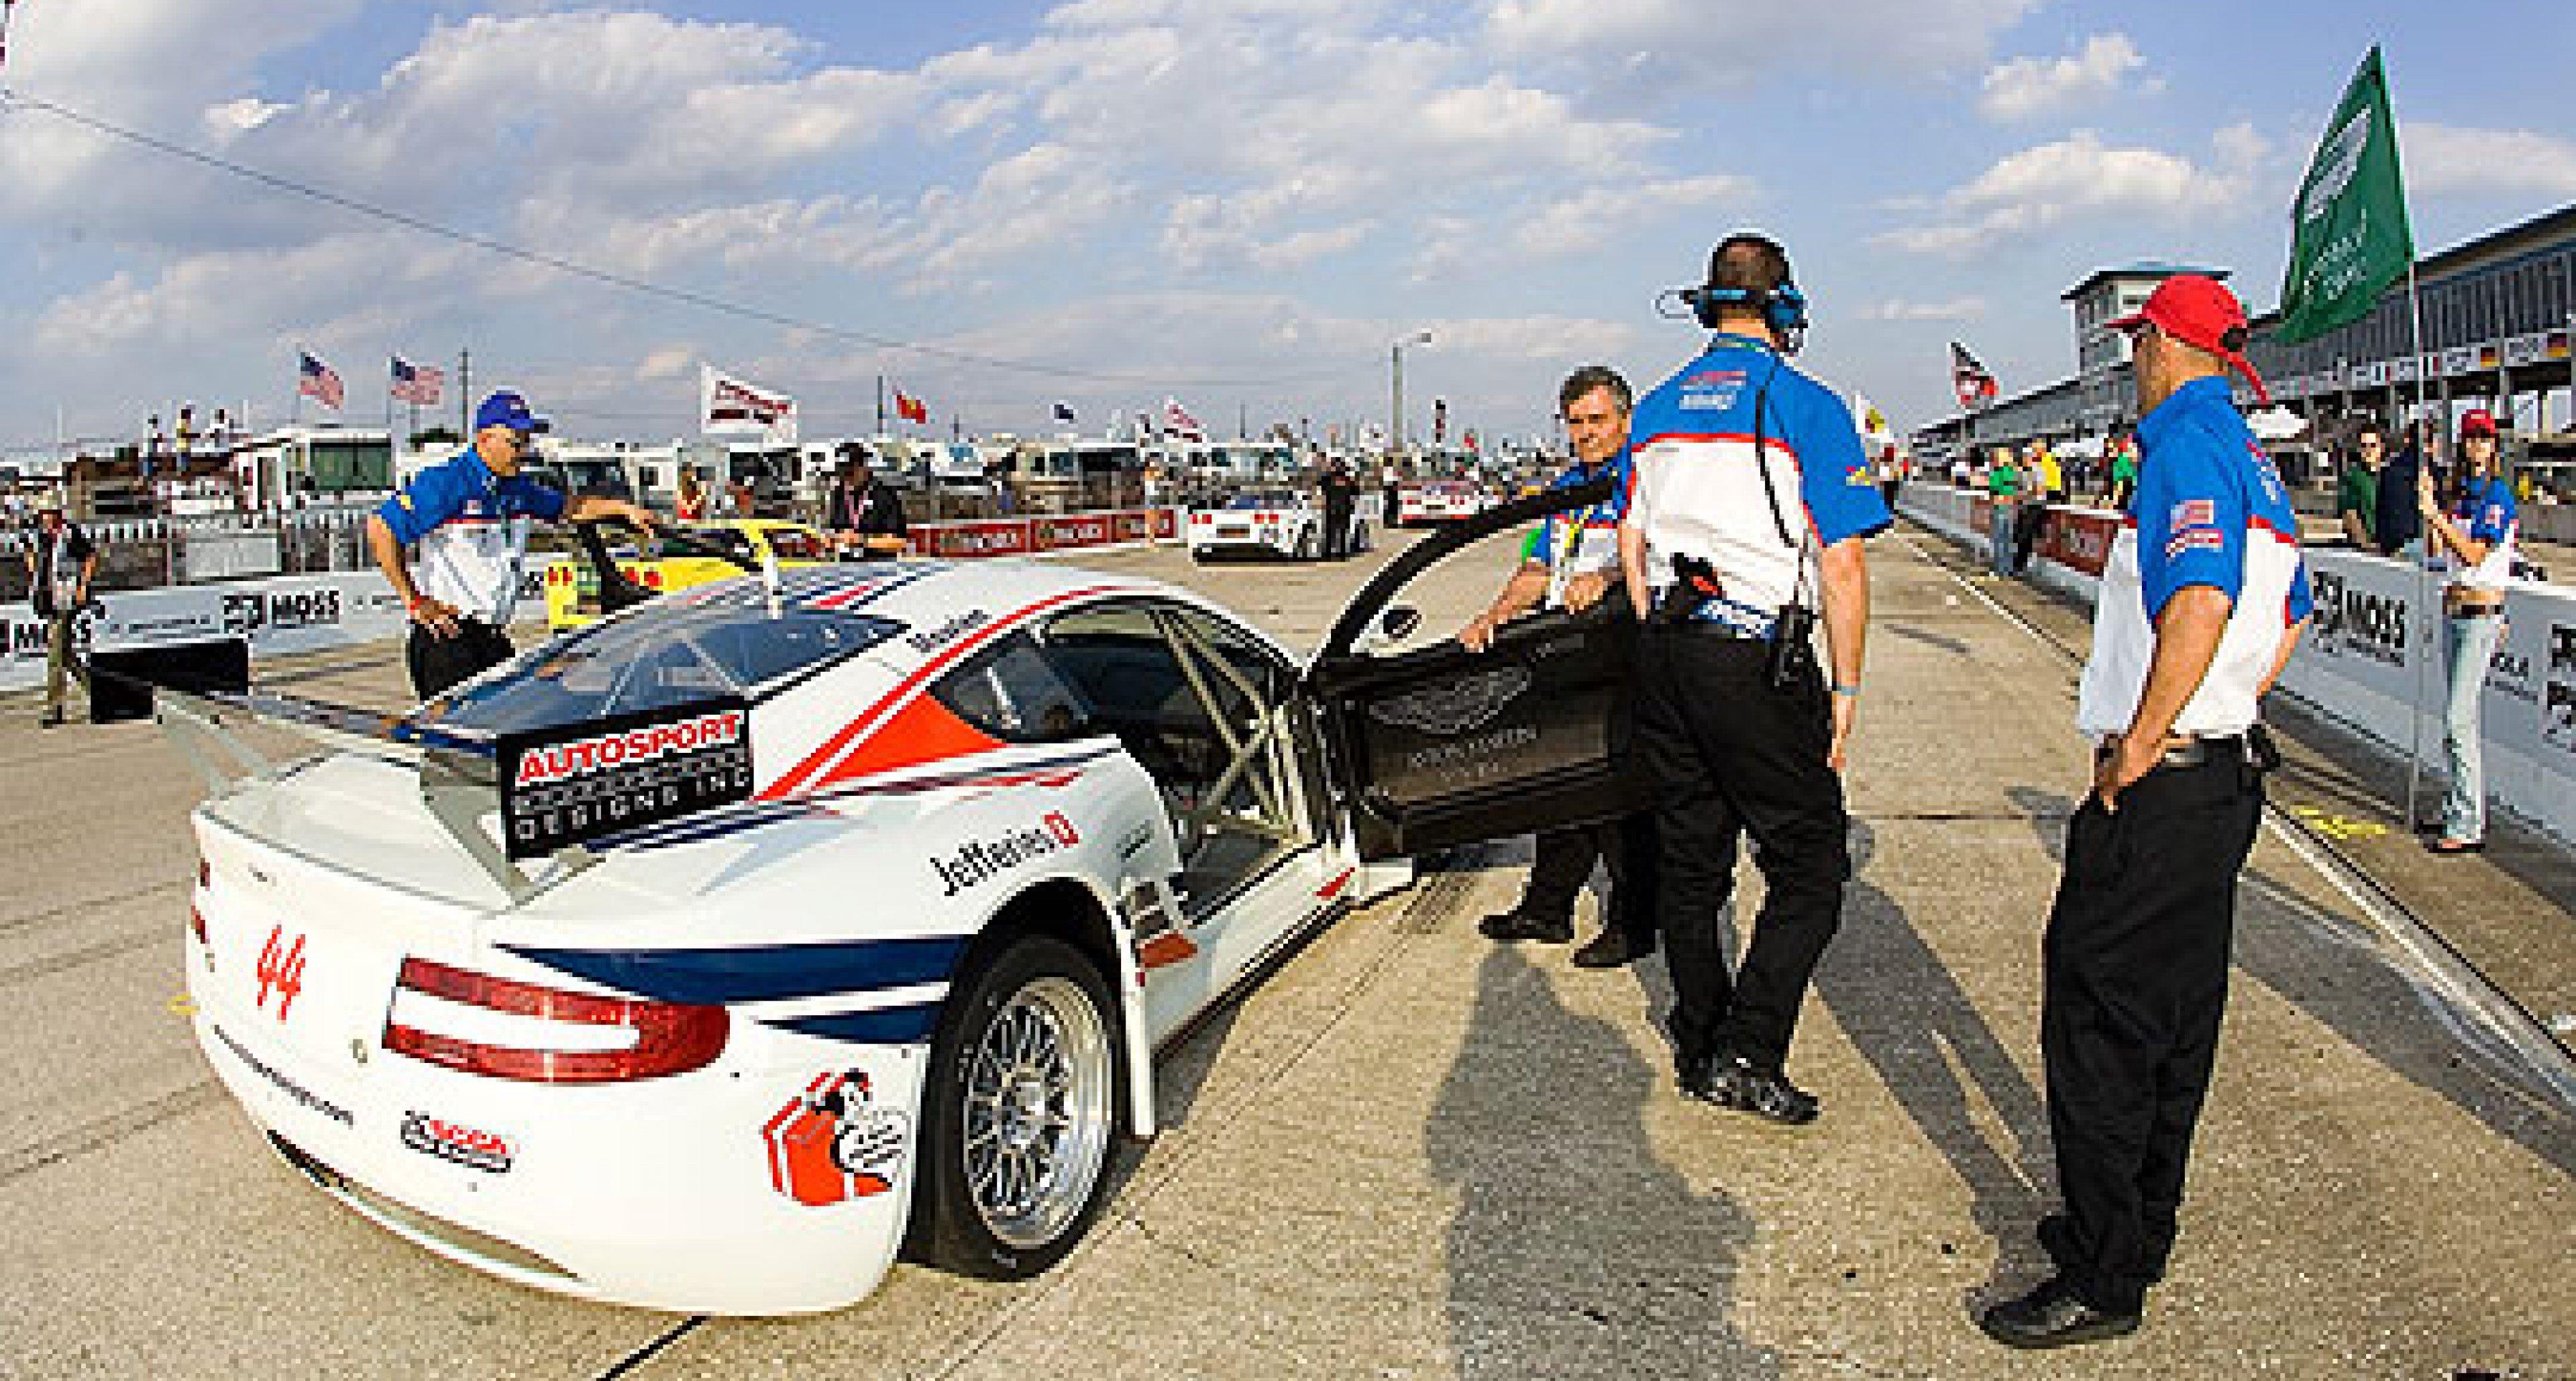 Autosport Designs Aston Martin DBRS9s at Sebring 2006